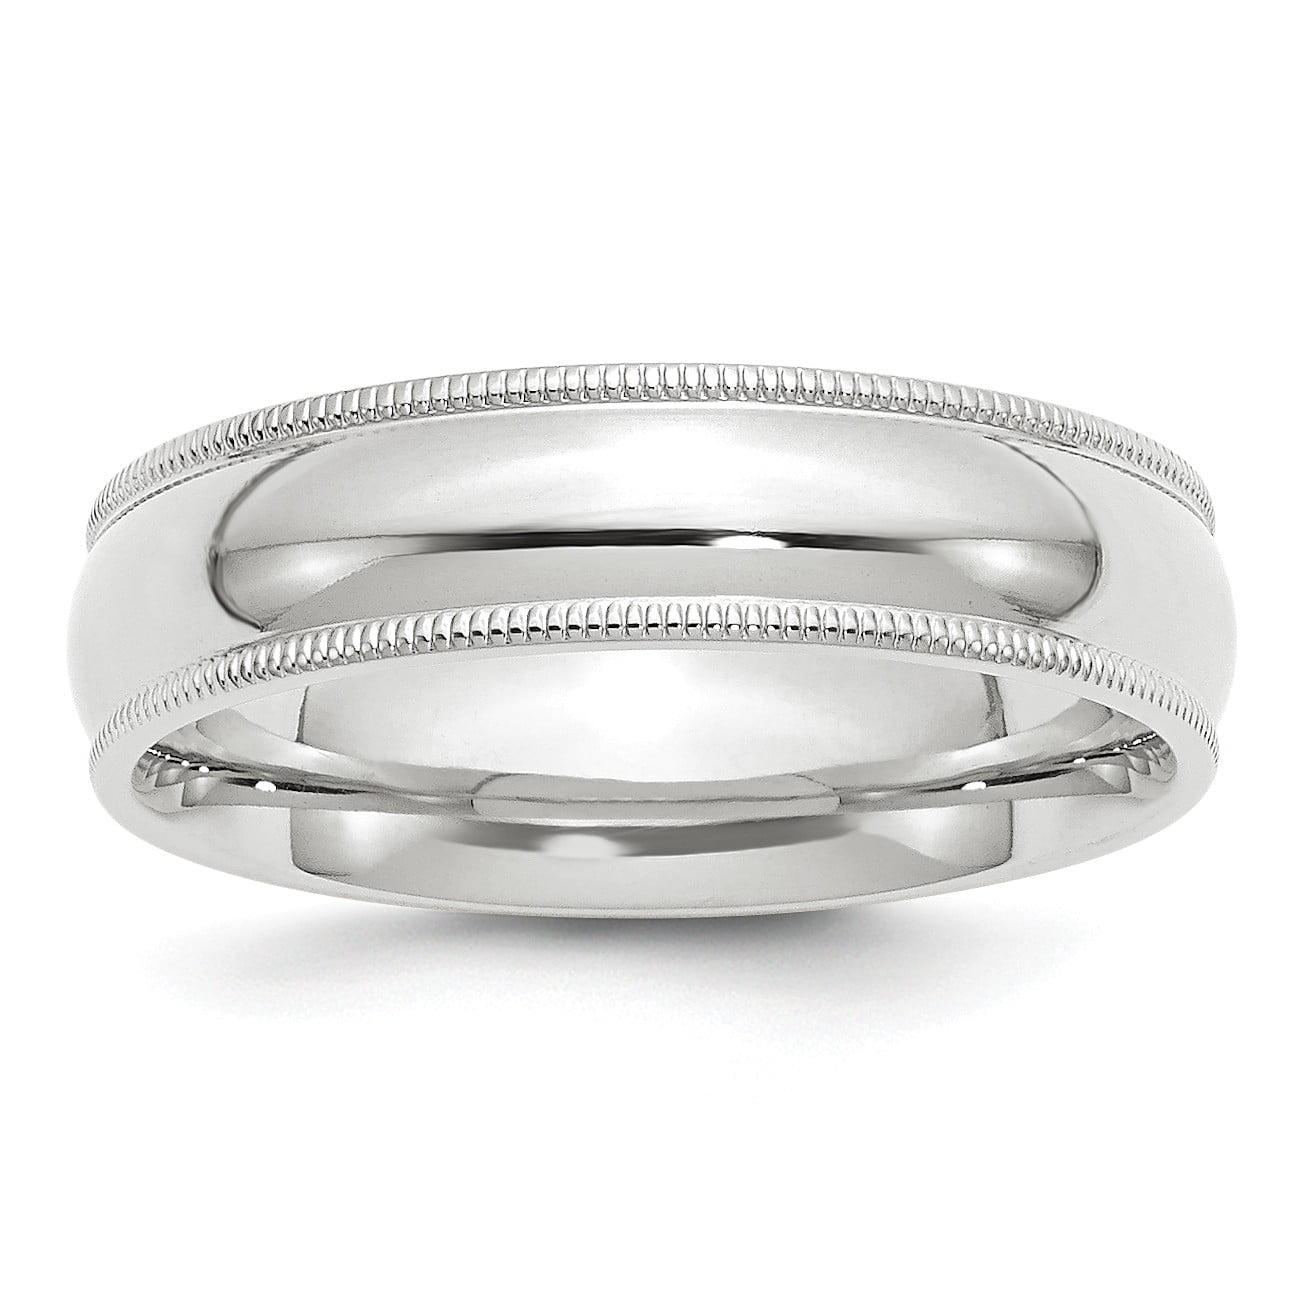 Bonyak Jewelry 10k White Gold 3 mm Milgrain Comfort-Fit Band Size 12.5